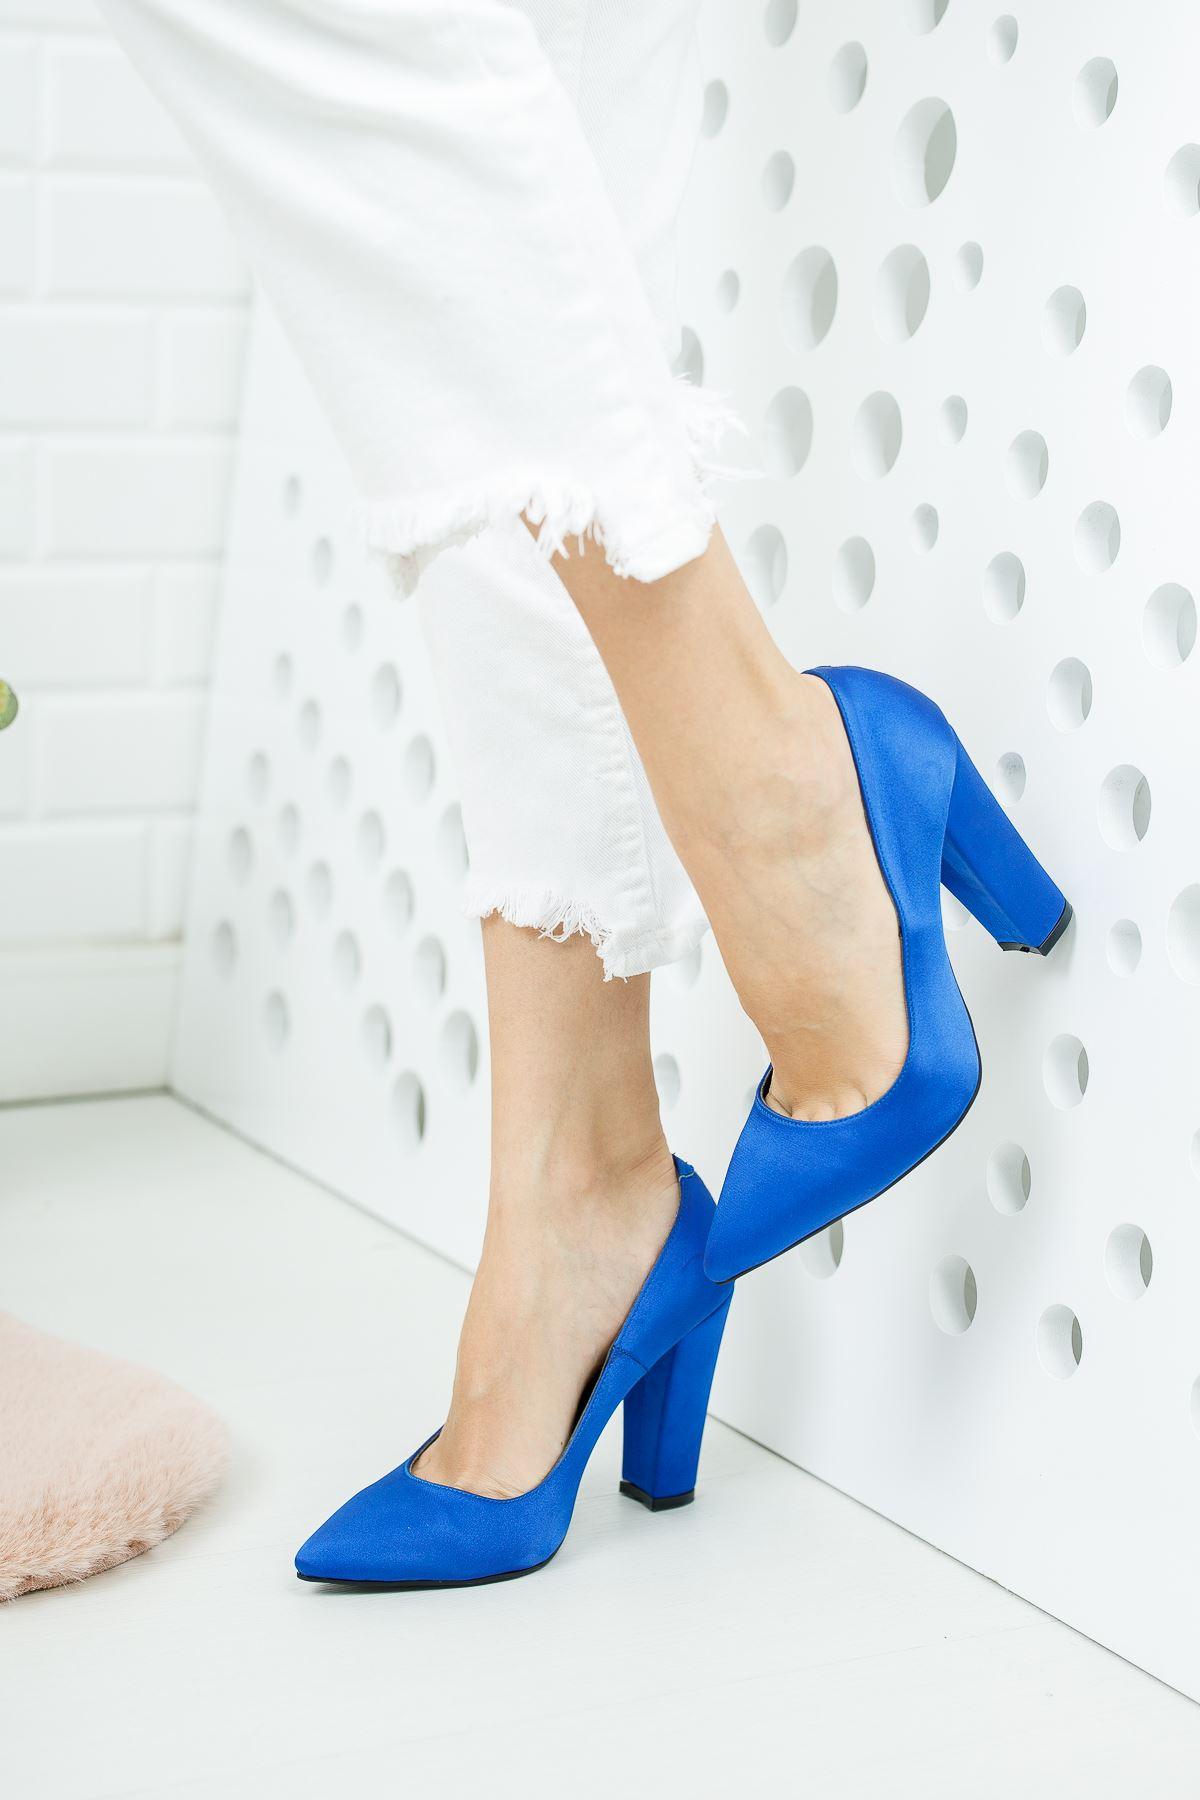 Tokyo Sax Mavi Saten Kadın Topuklu Ayakkabı Stiletto